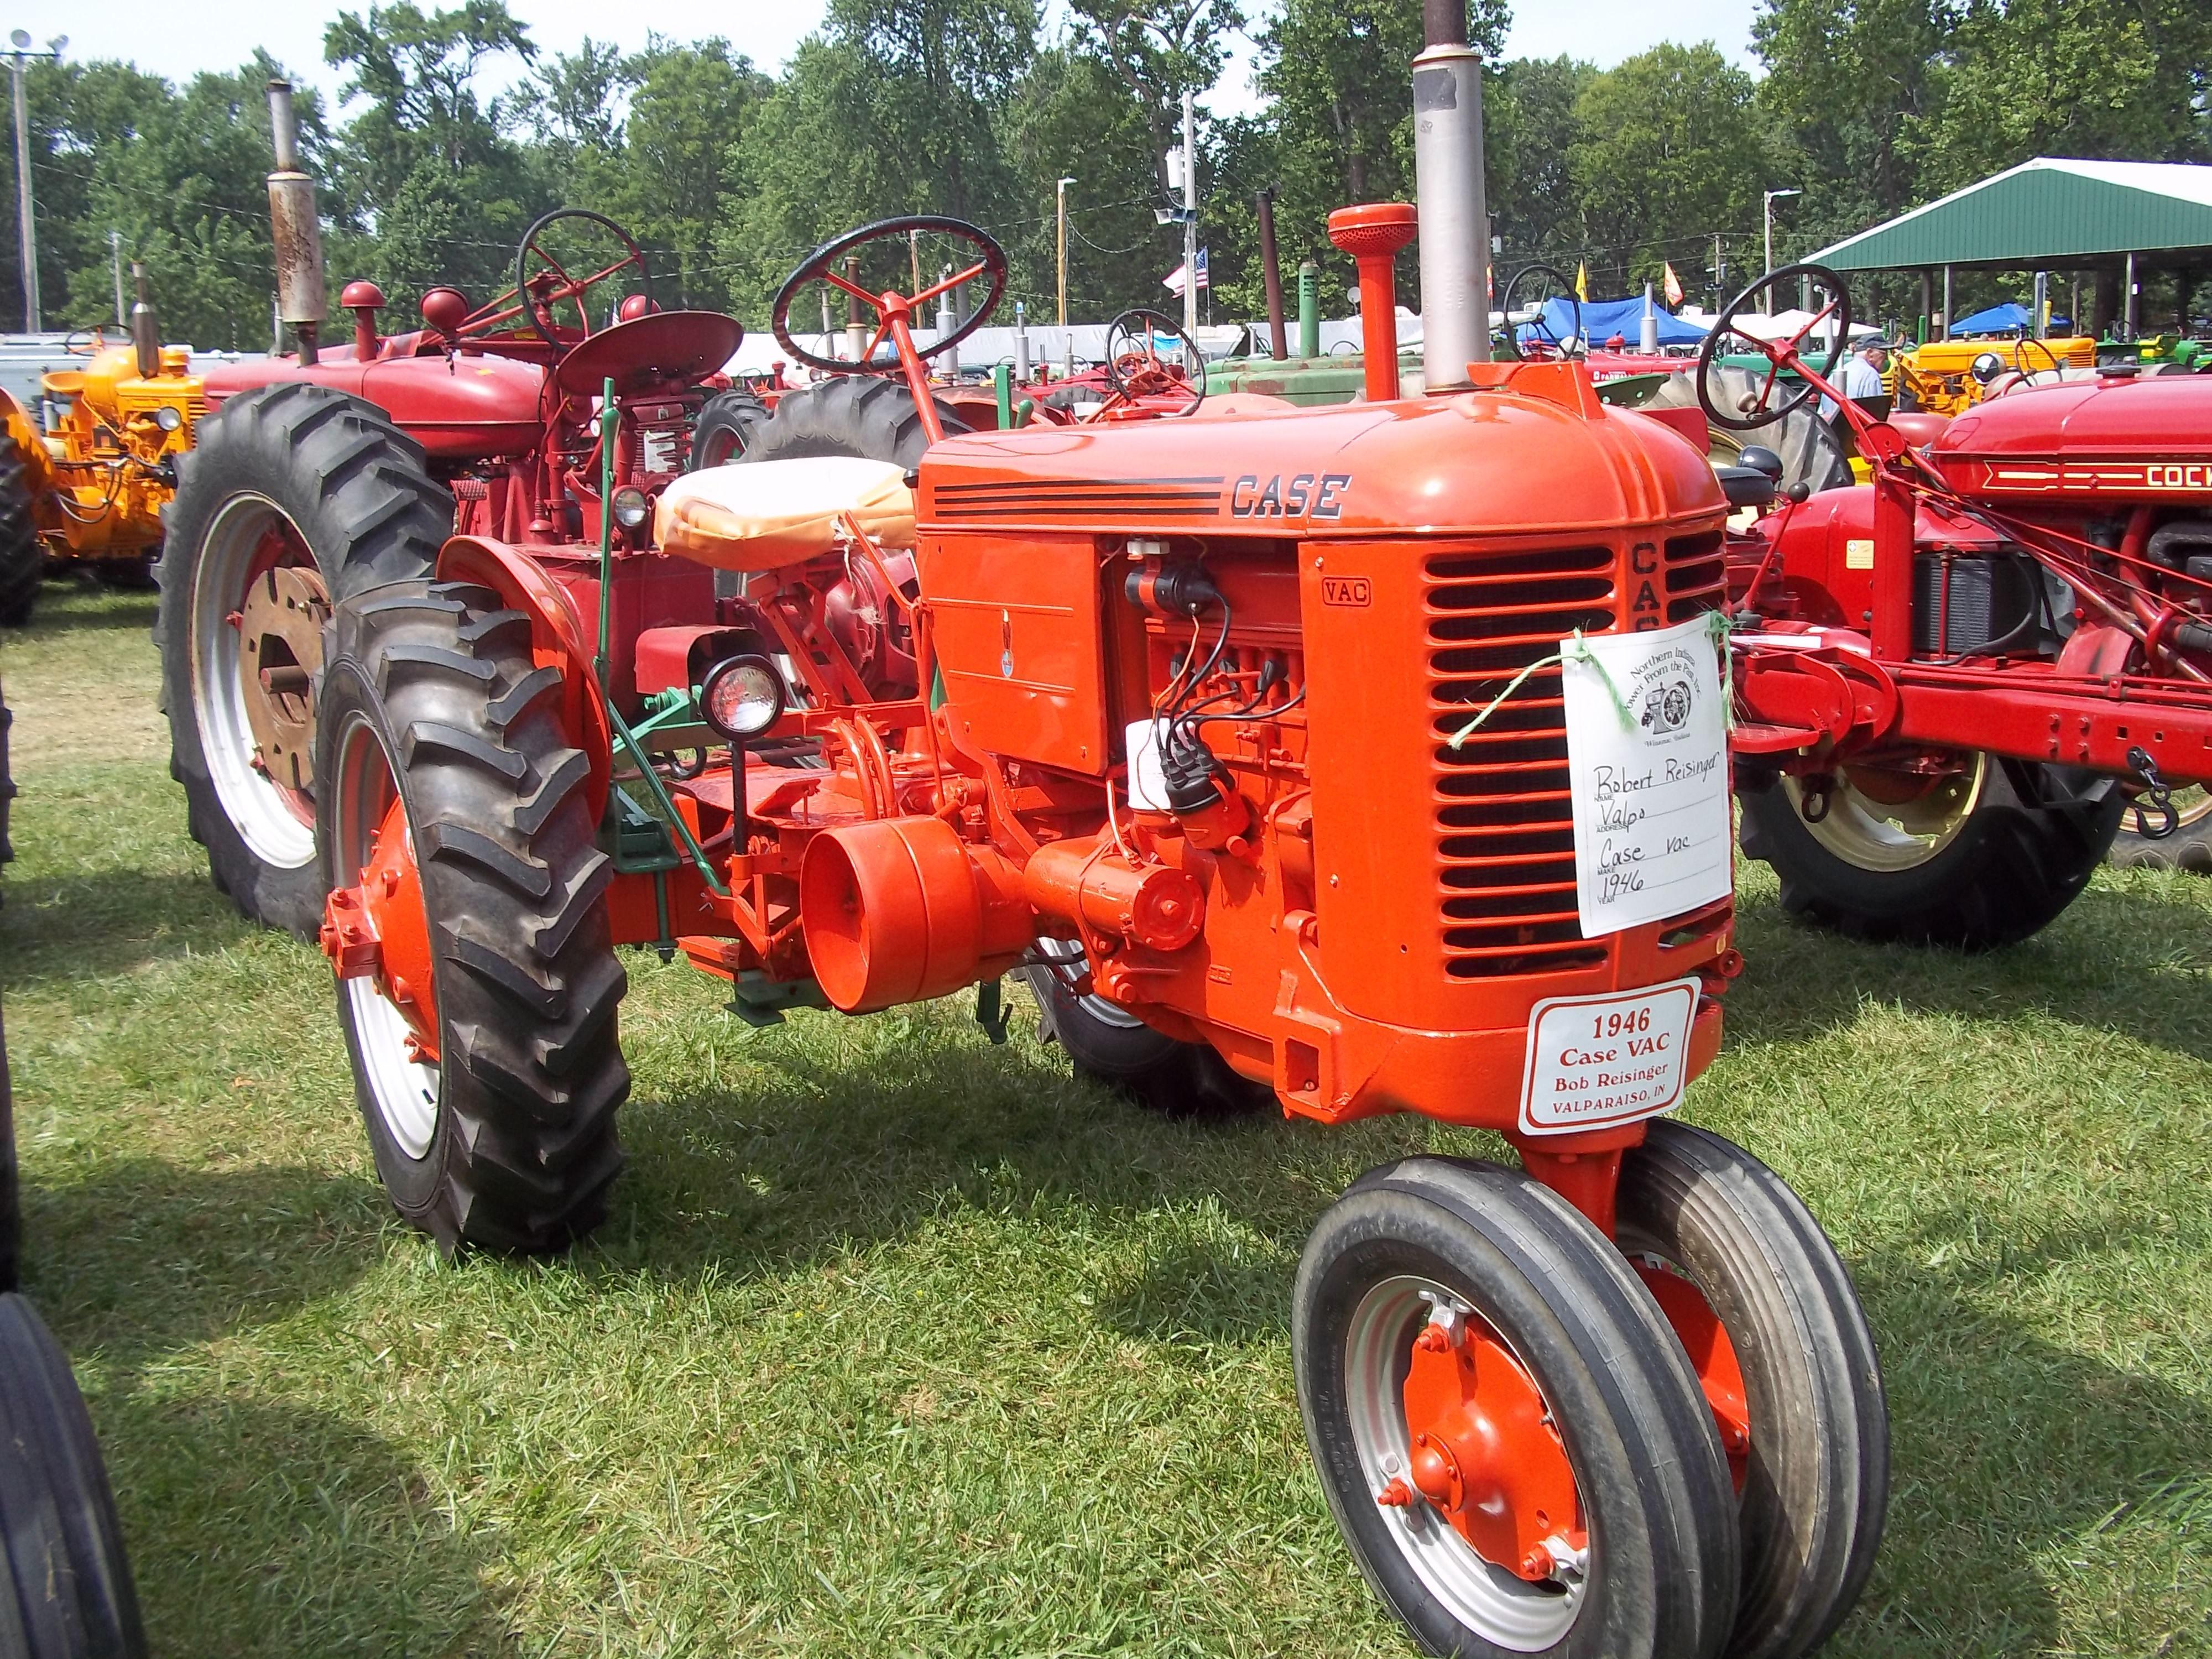 Case Tractor Mowers : Case vac caseih equipment pinterest